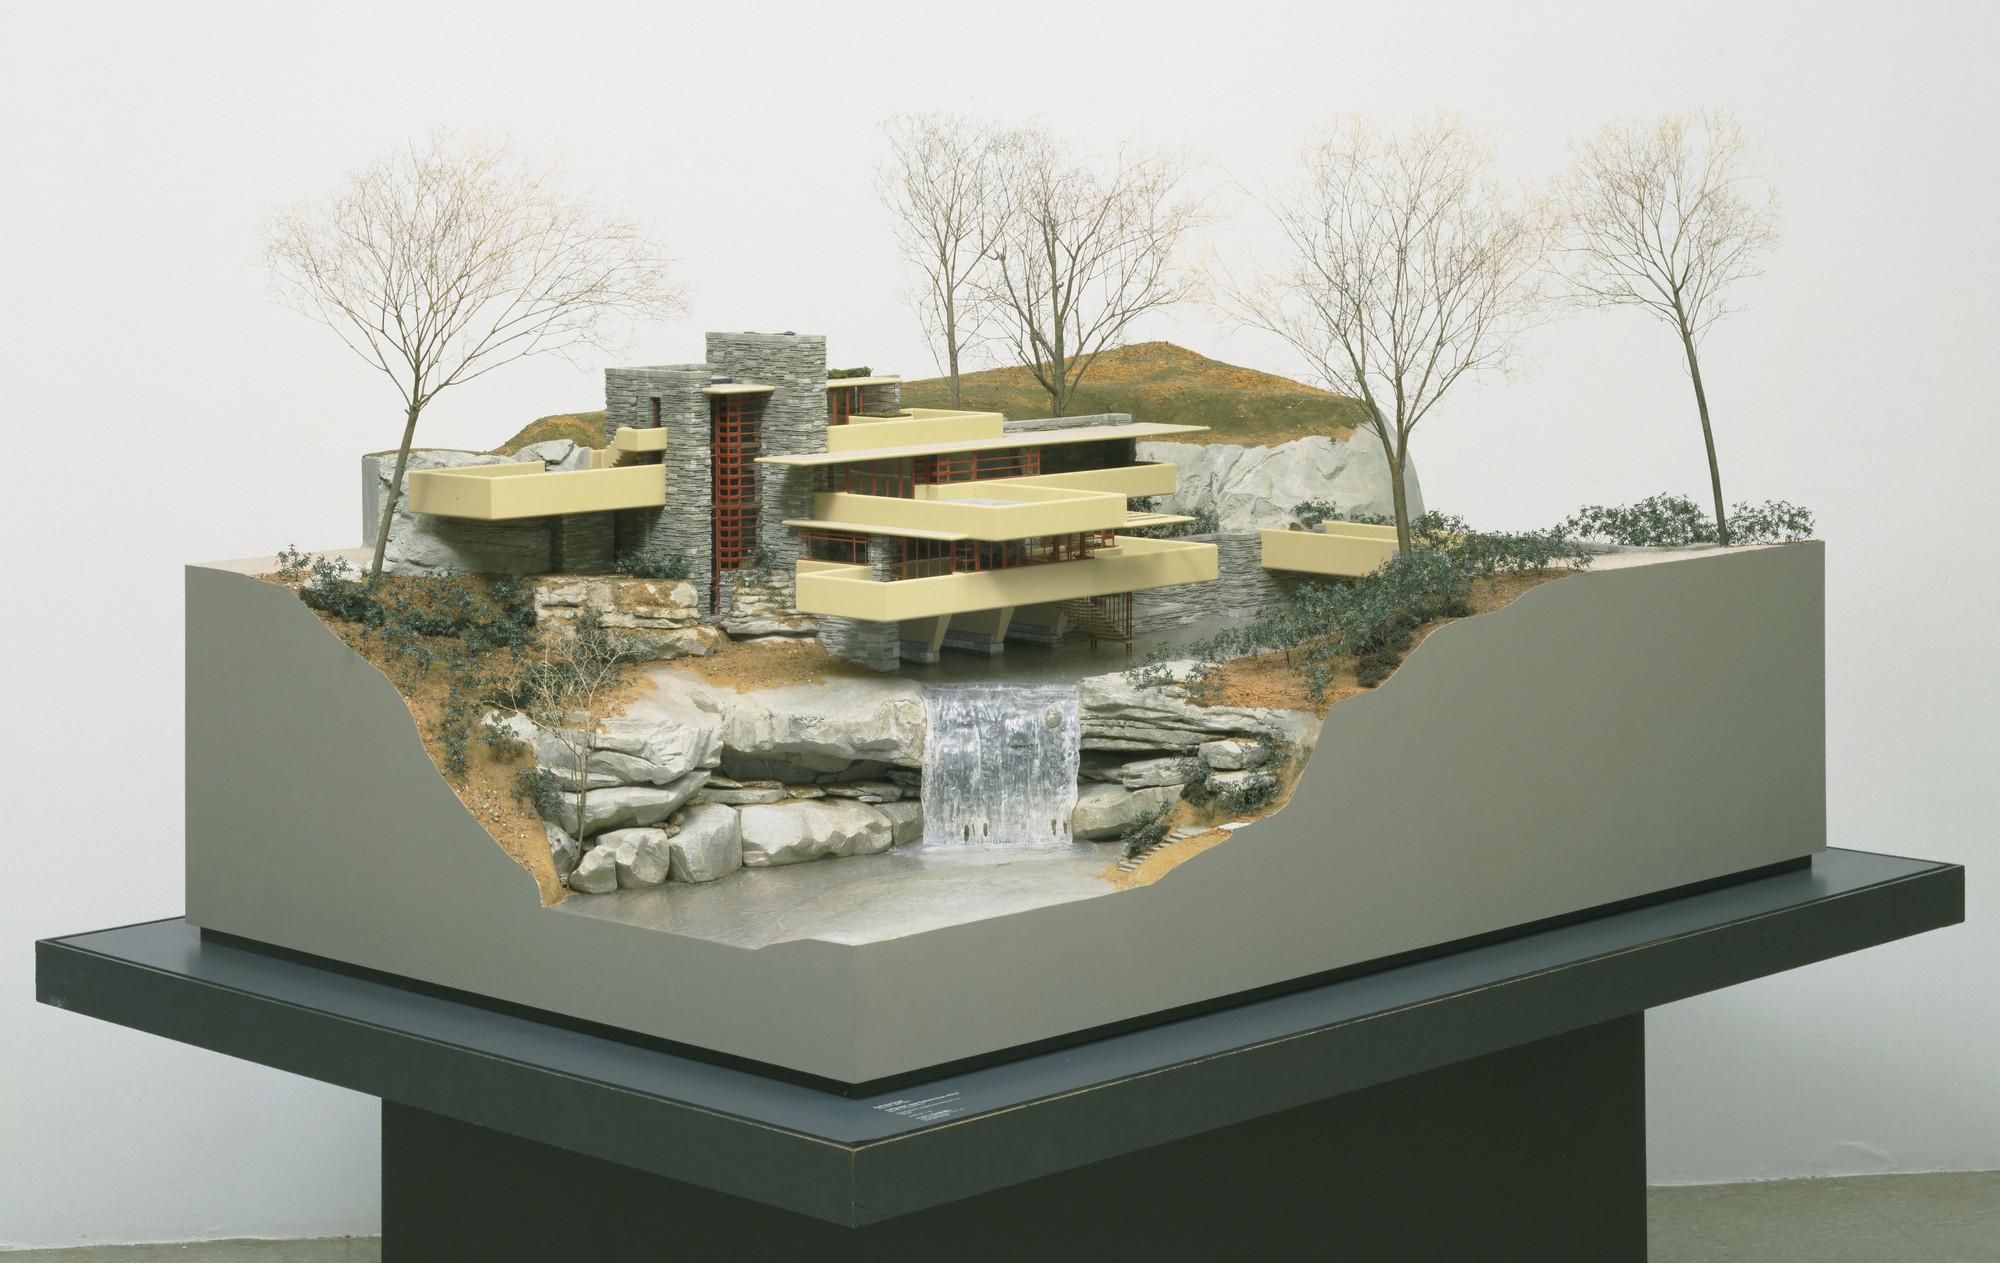 Weg sparen heiß-verkauf freiheit neue Version Frank Lloyd Wright. Fallingwater, Edgar J. Kaufmann House ...